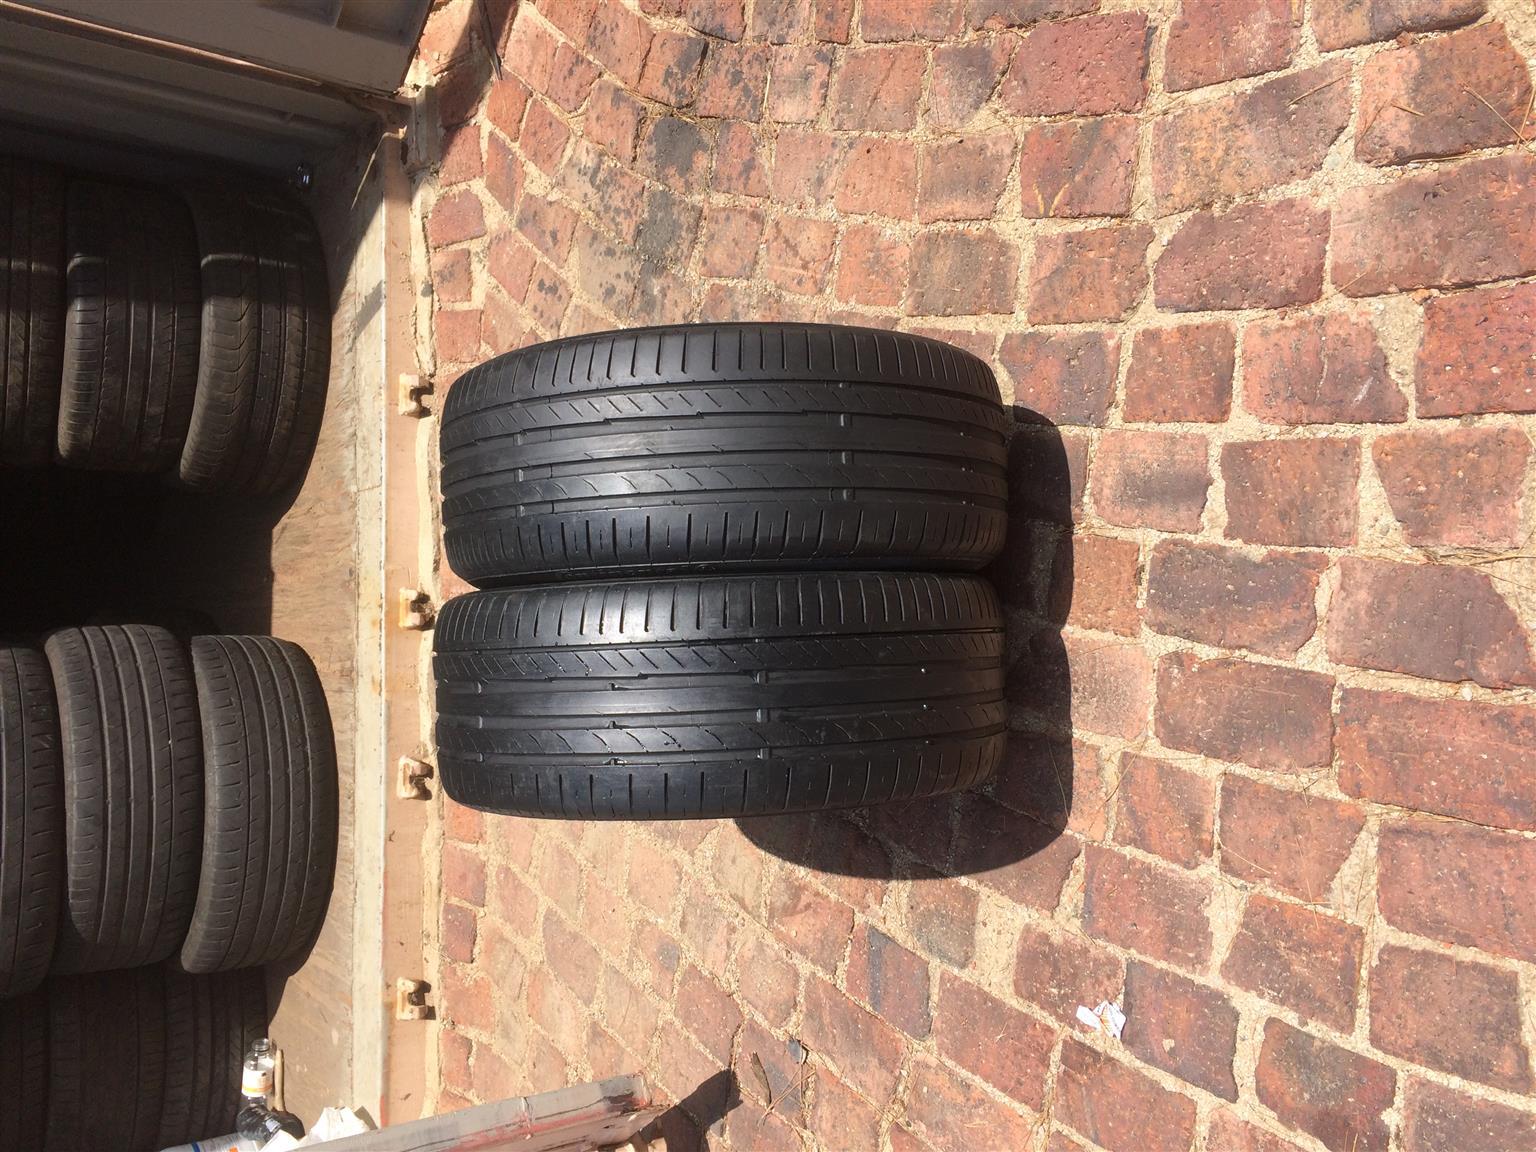 225/45/17 x 2 Continental Tyre(75% thread) 0835218884